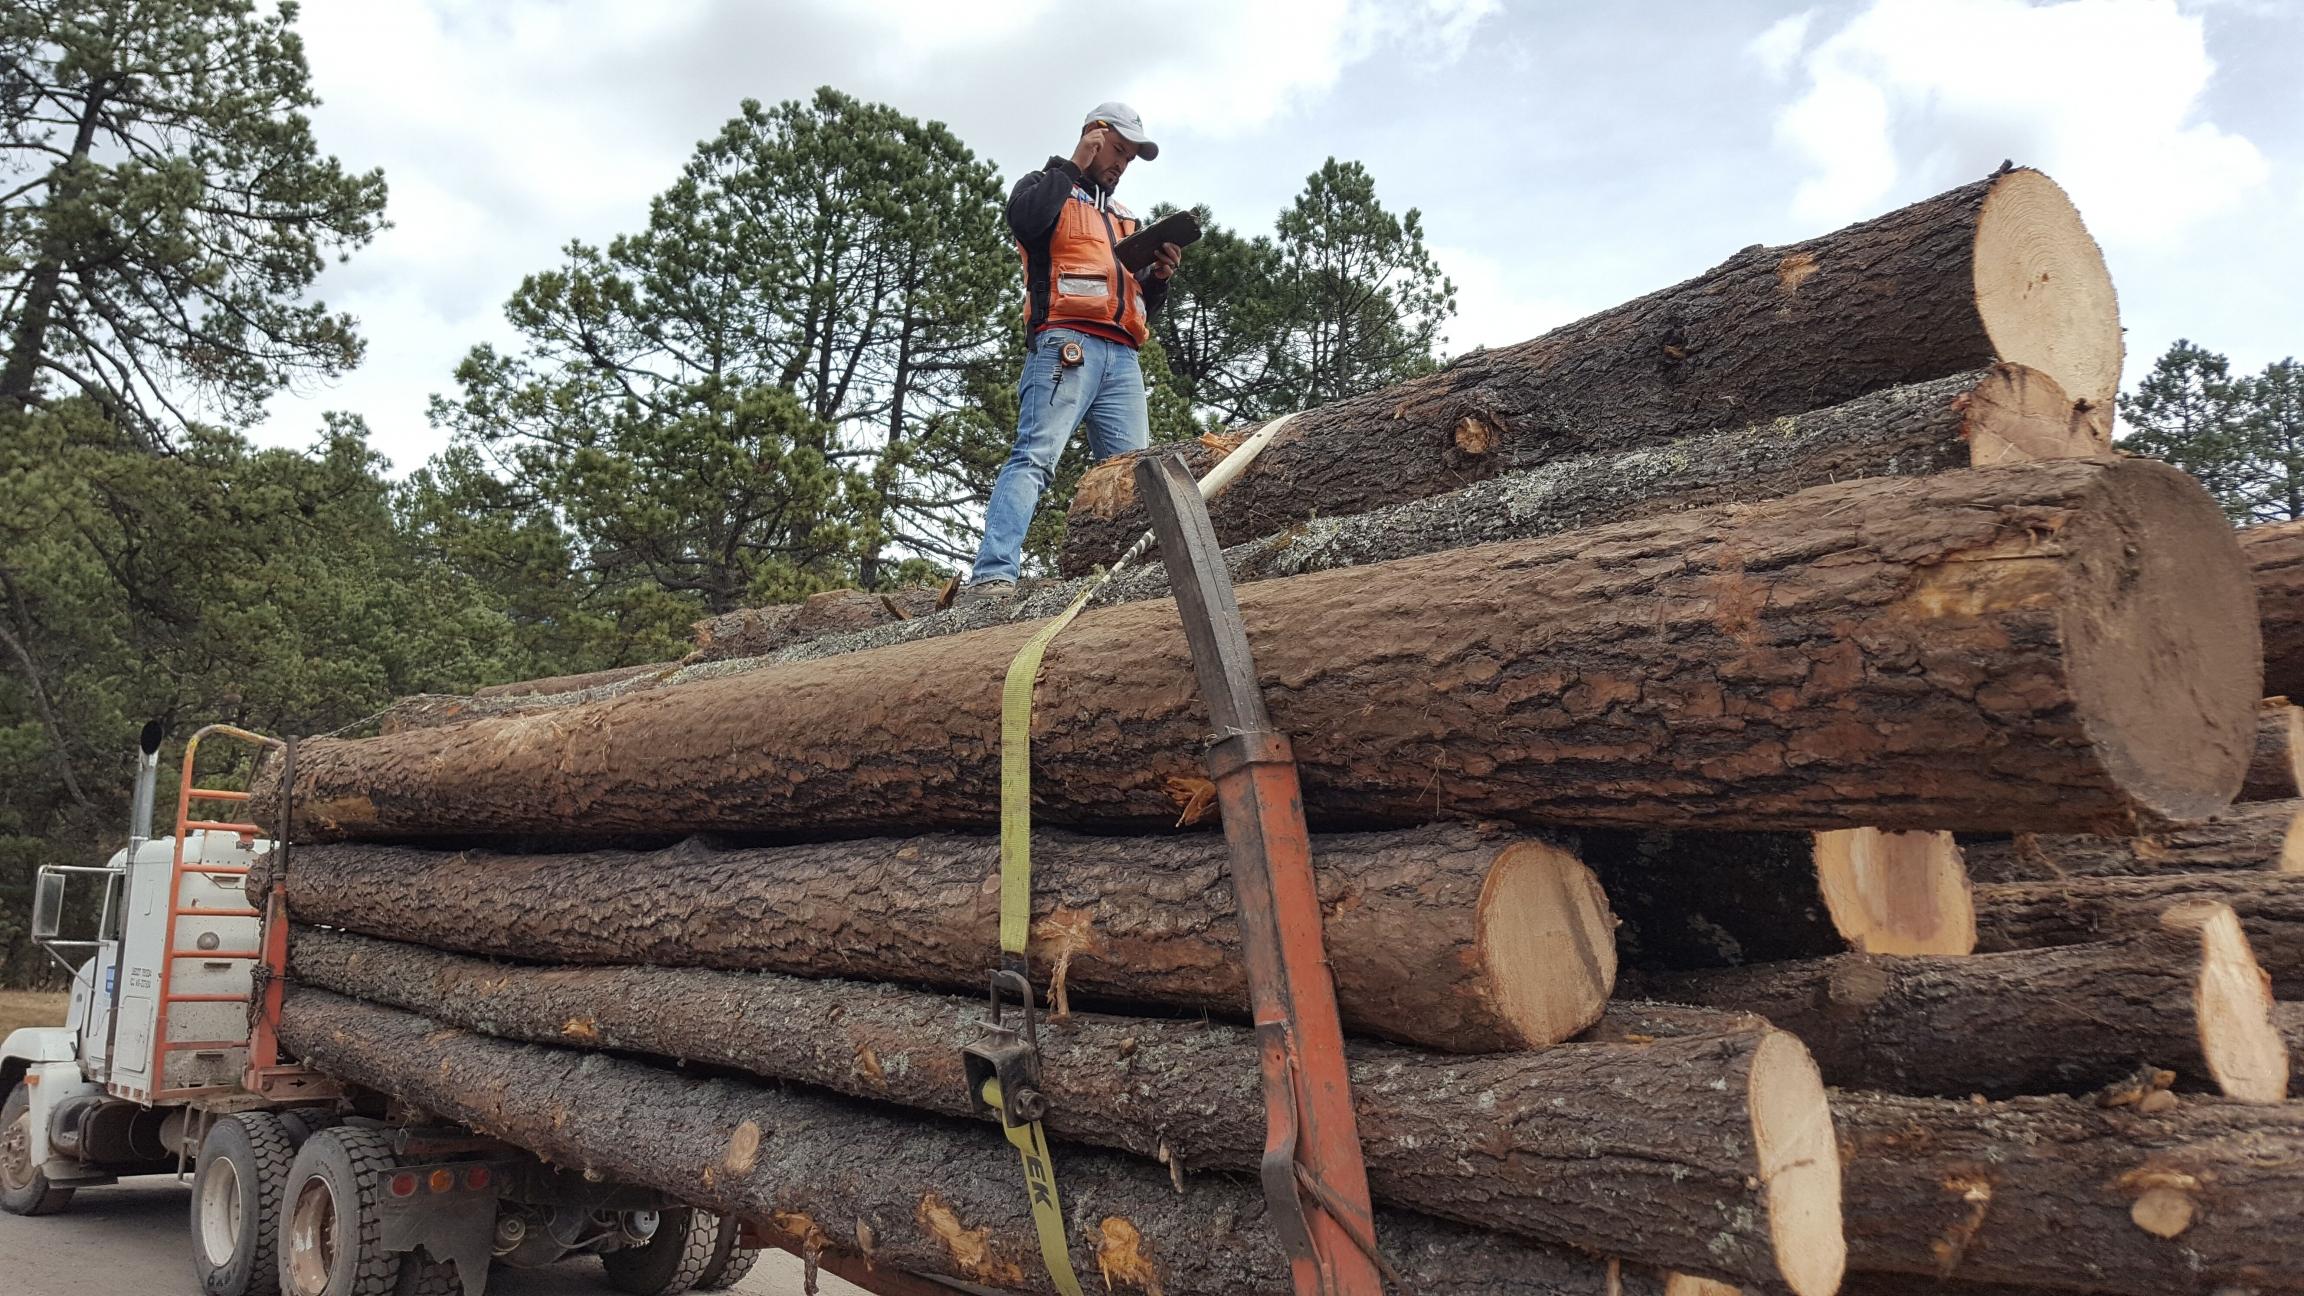 Logs loaded onto a truck